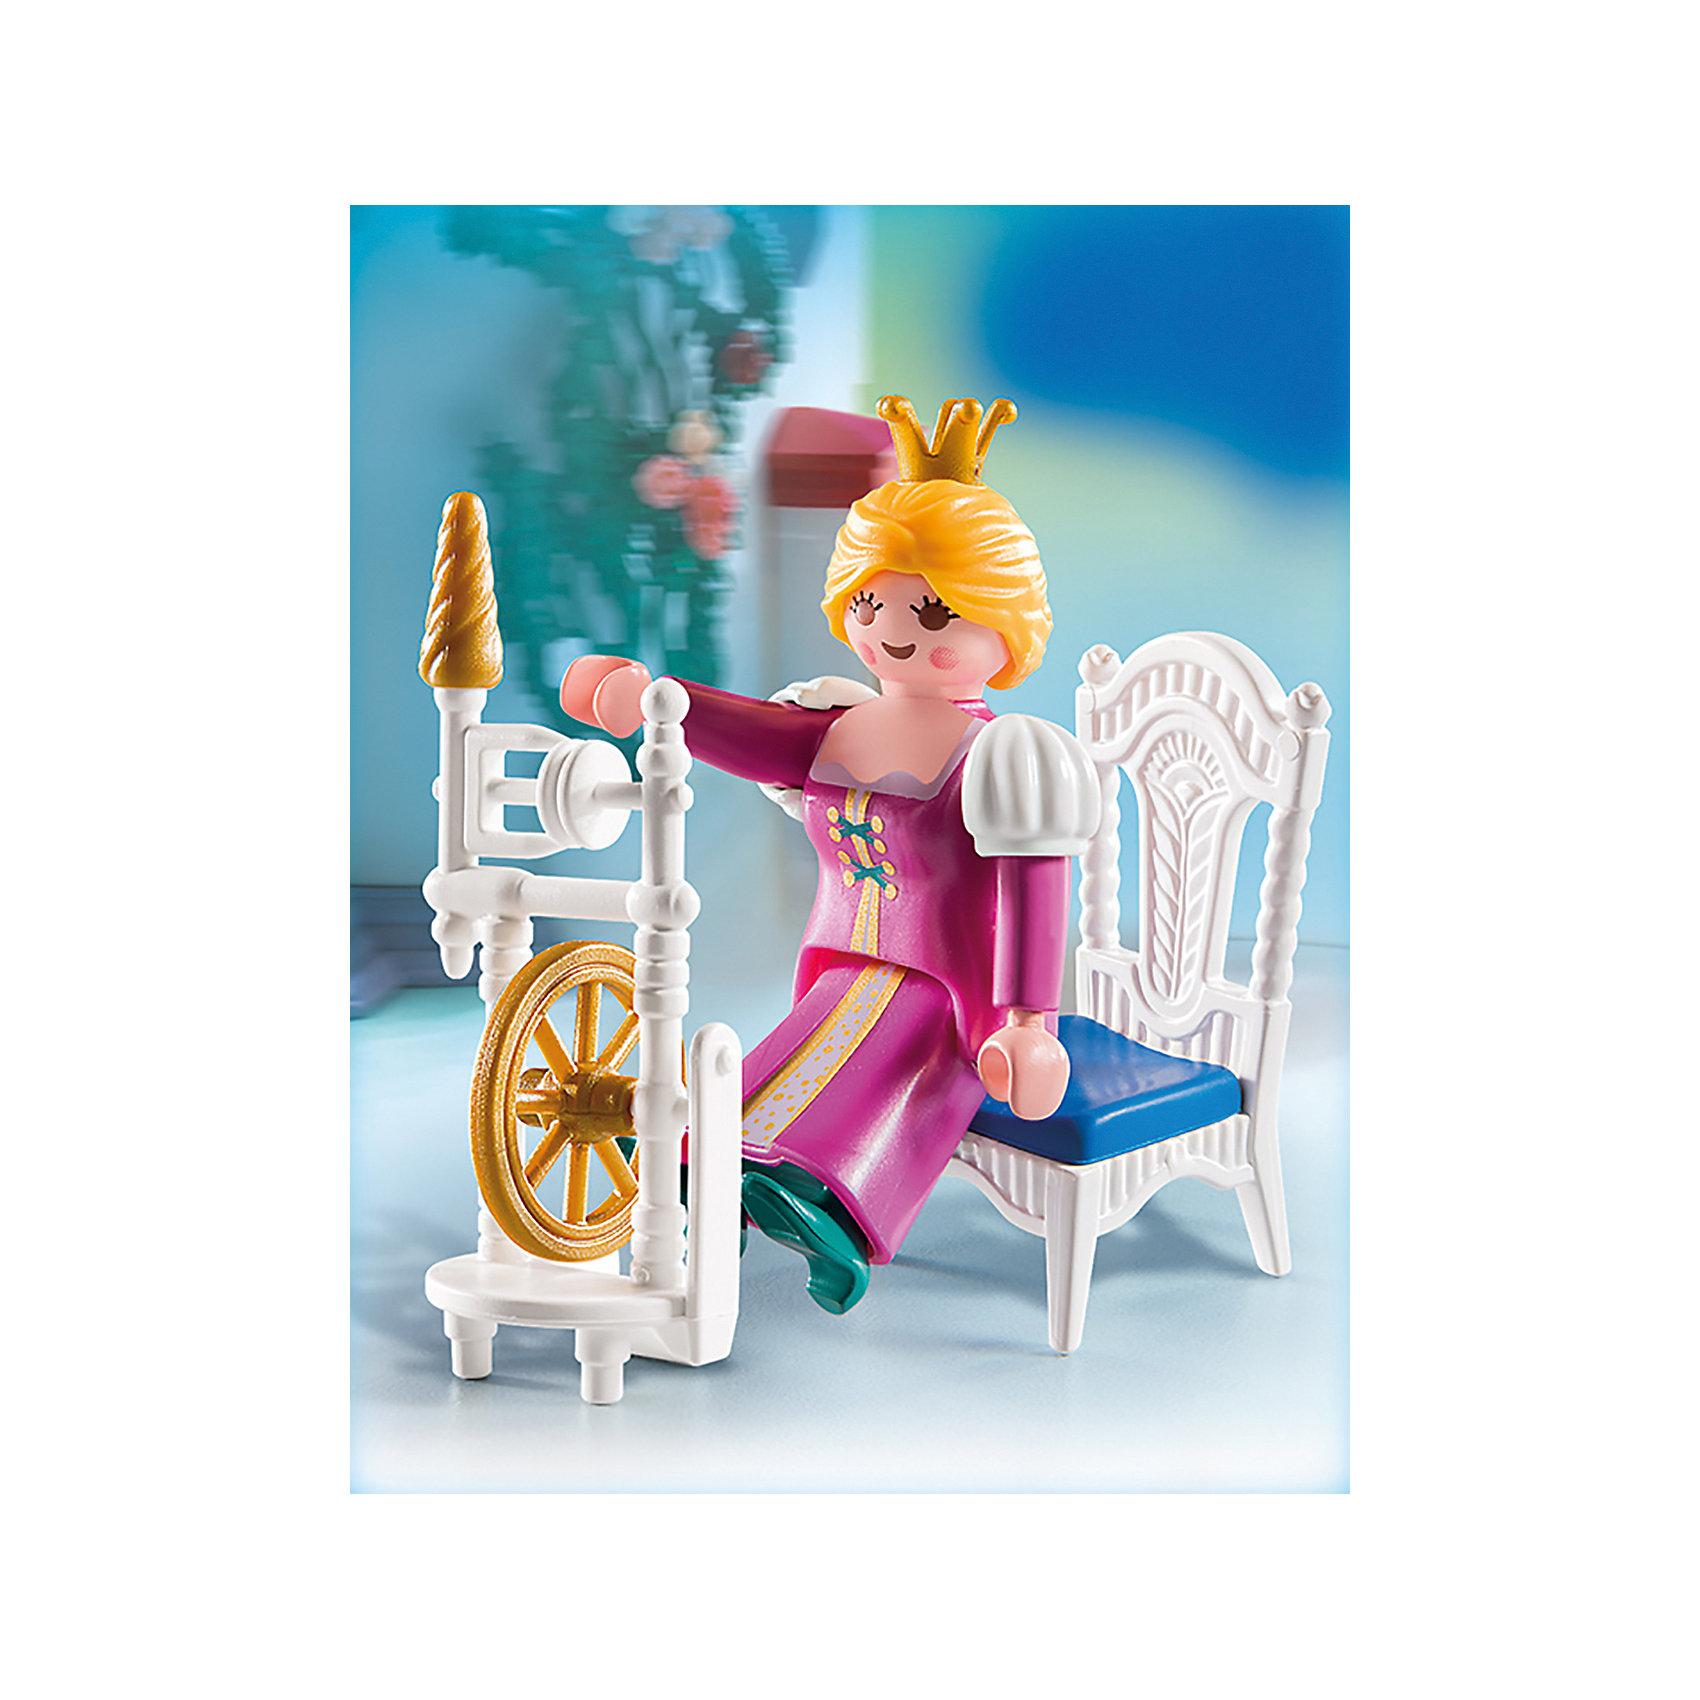 PLAYMOBIL® Экстра-набор: Принцесса с прялкой, PLAYMOBIL playmobil® playmobil 5411 экстра набор ангел и демон